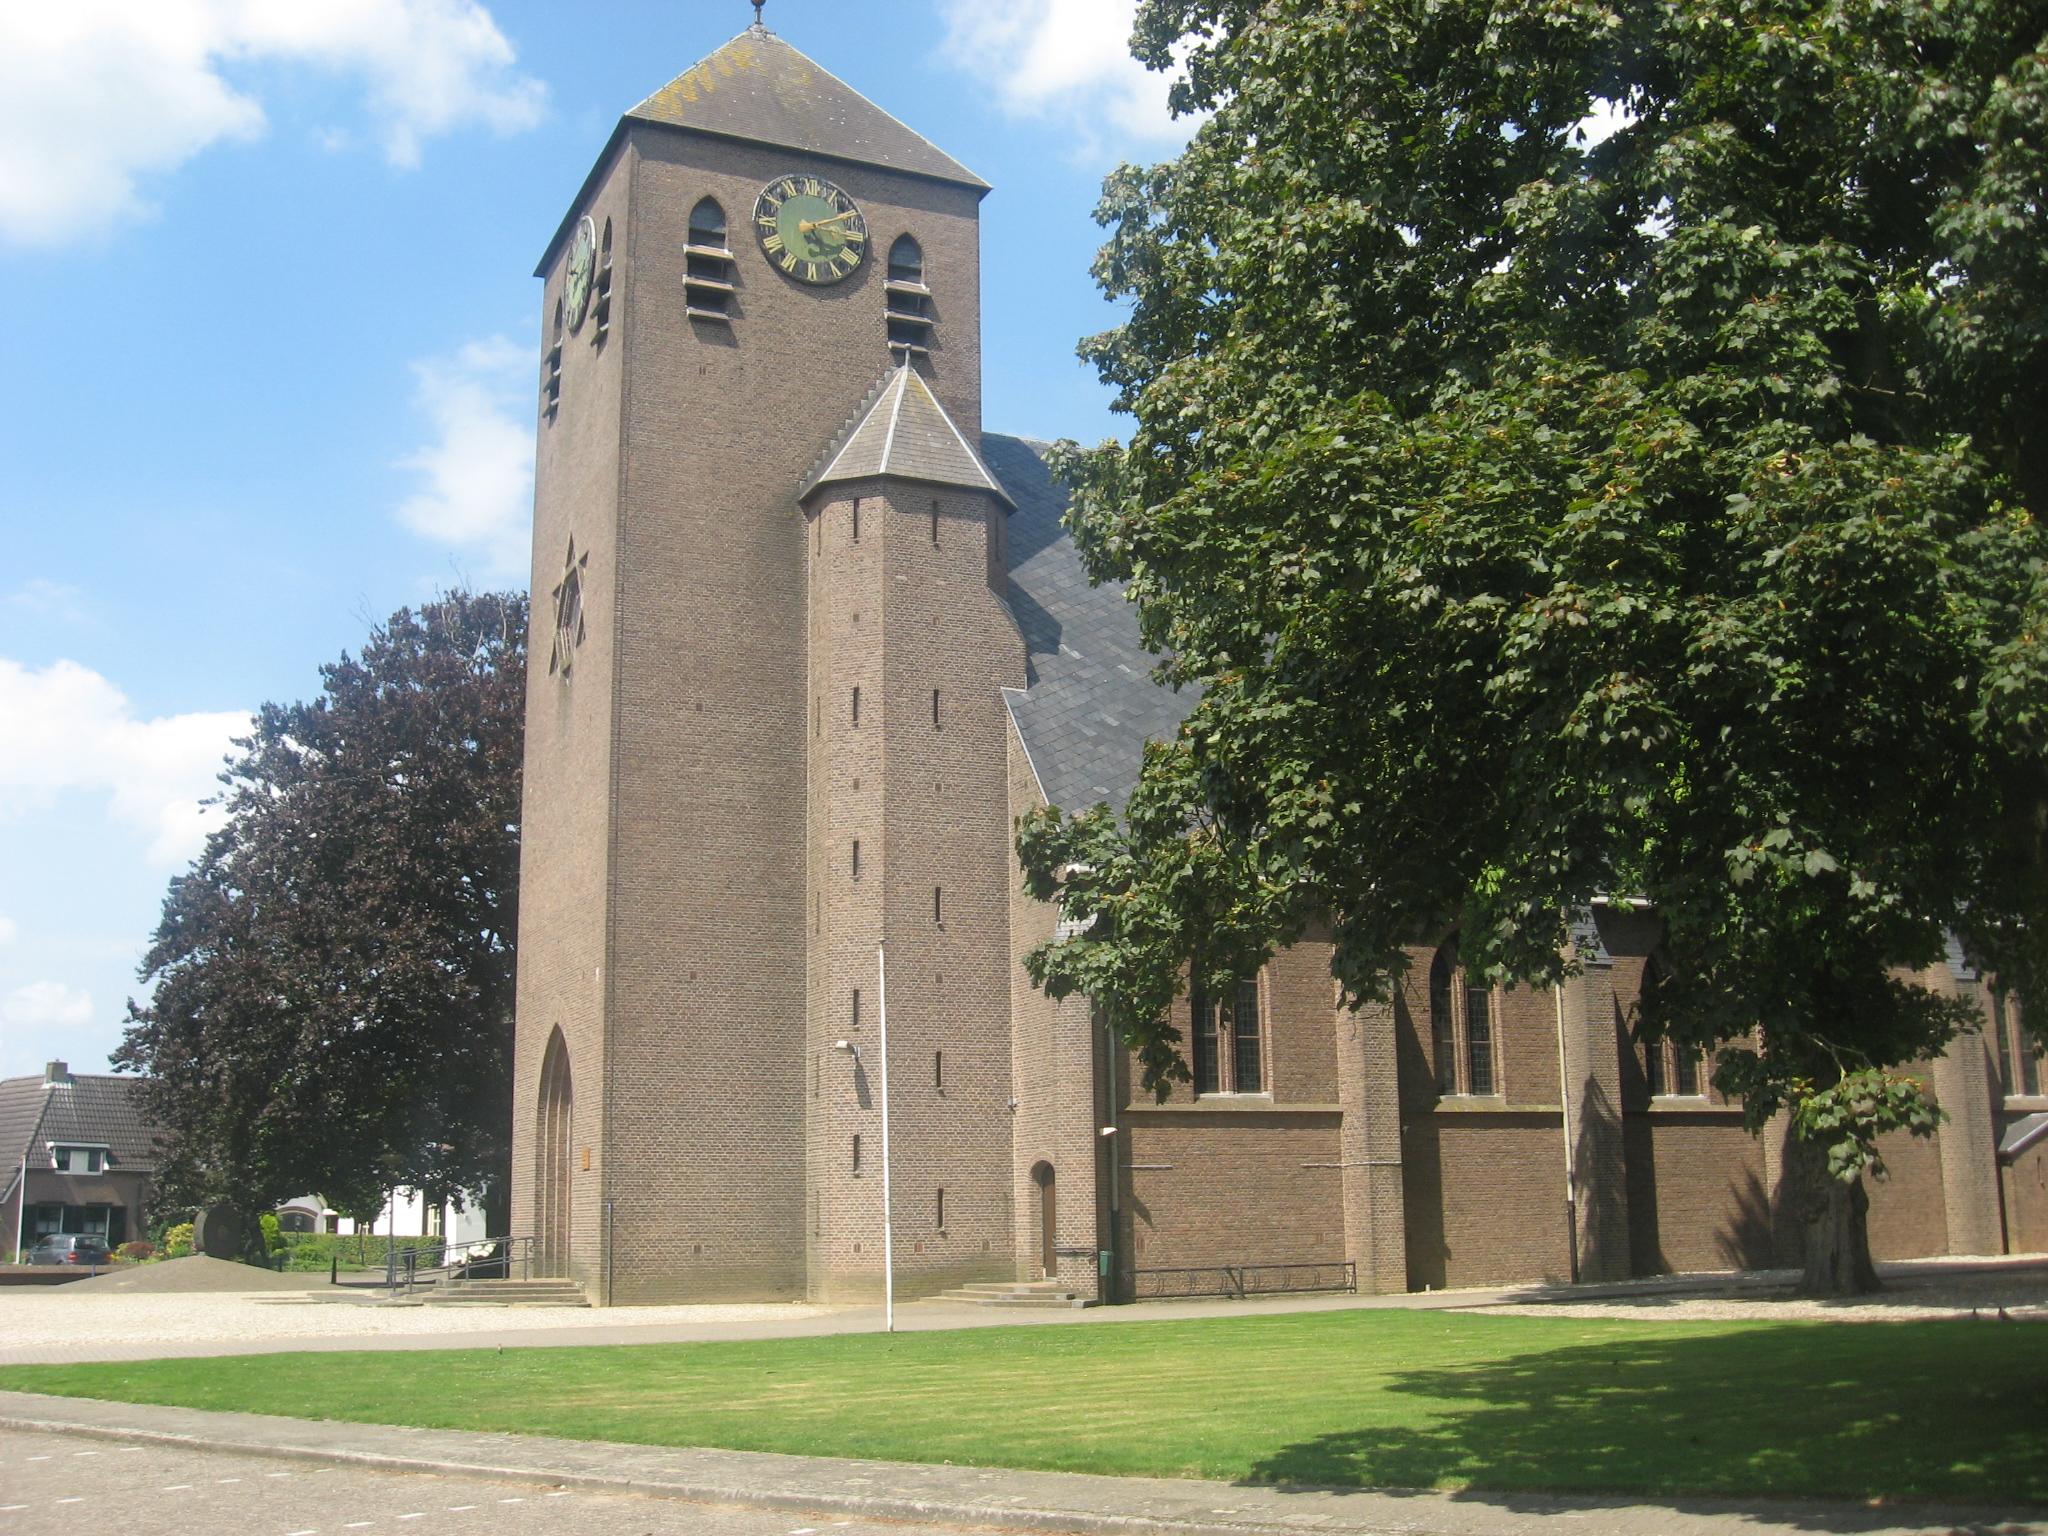 Keijenborg Kerkstraat 7 R.K. Kerk St. Johannes de Doper